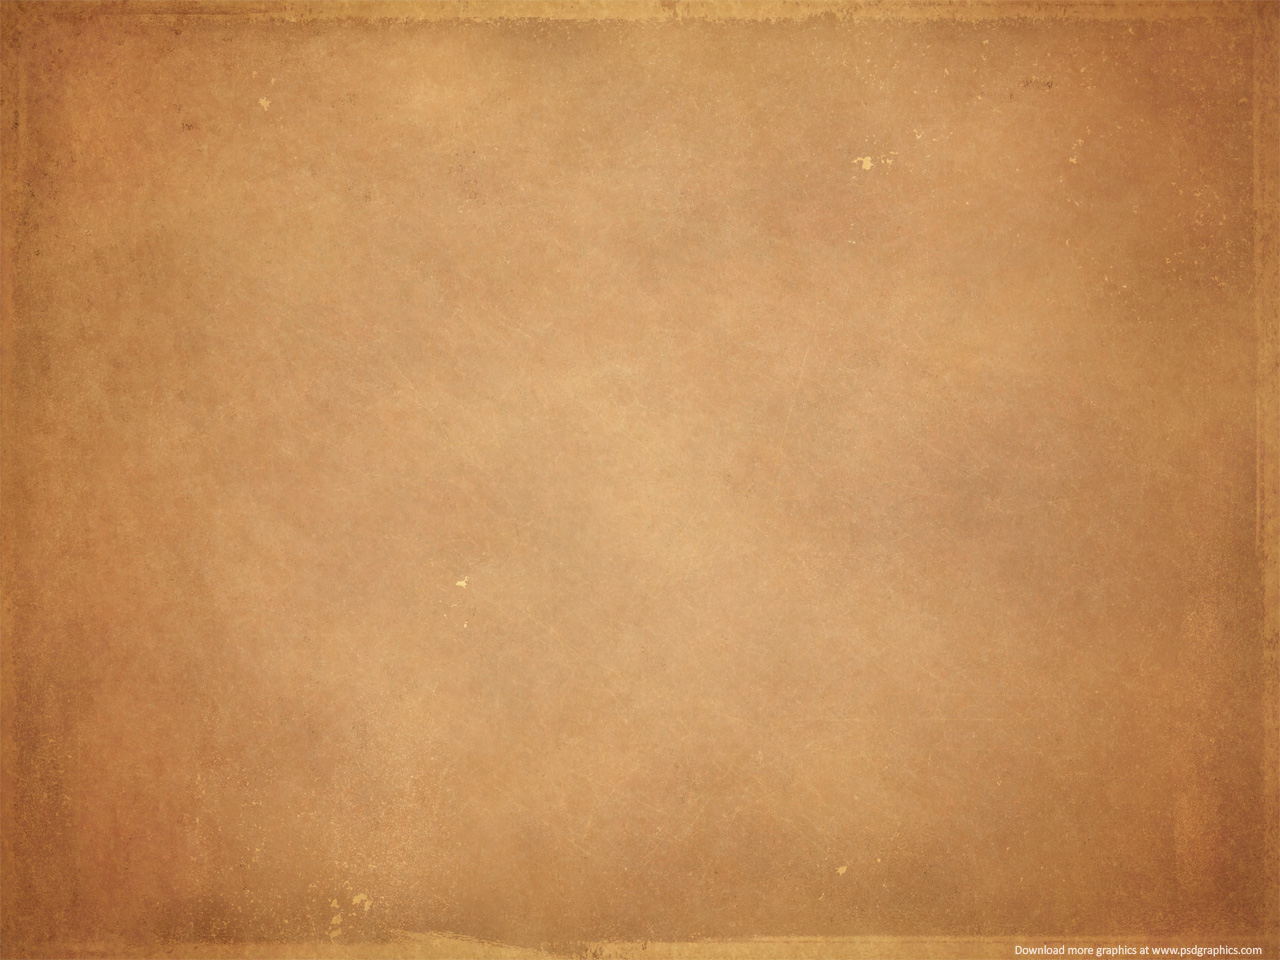 Medium size preview 1280x960px Brown antique paper 1280x960